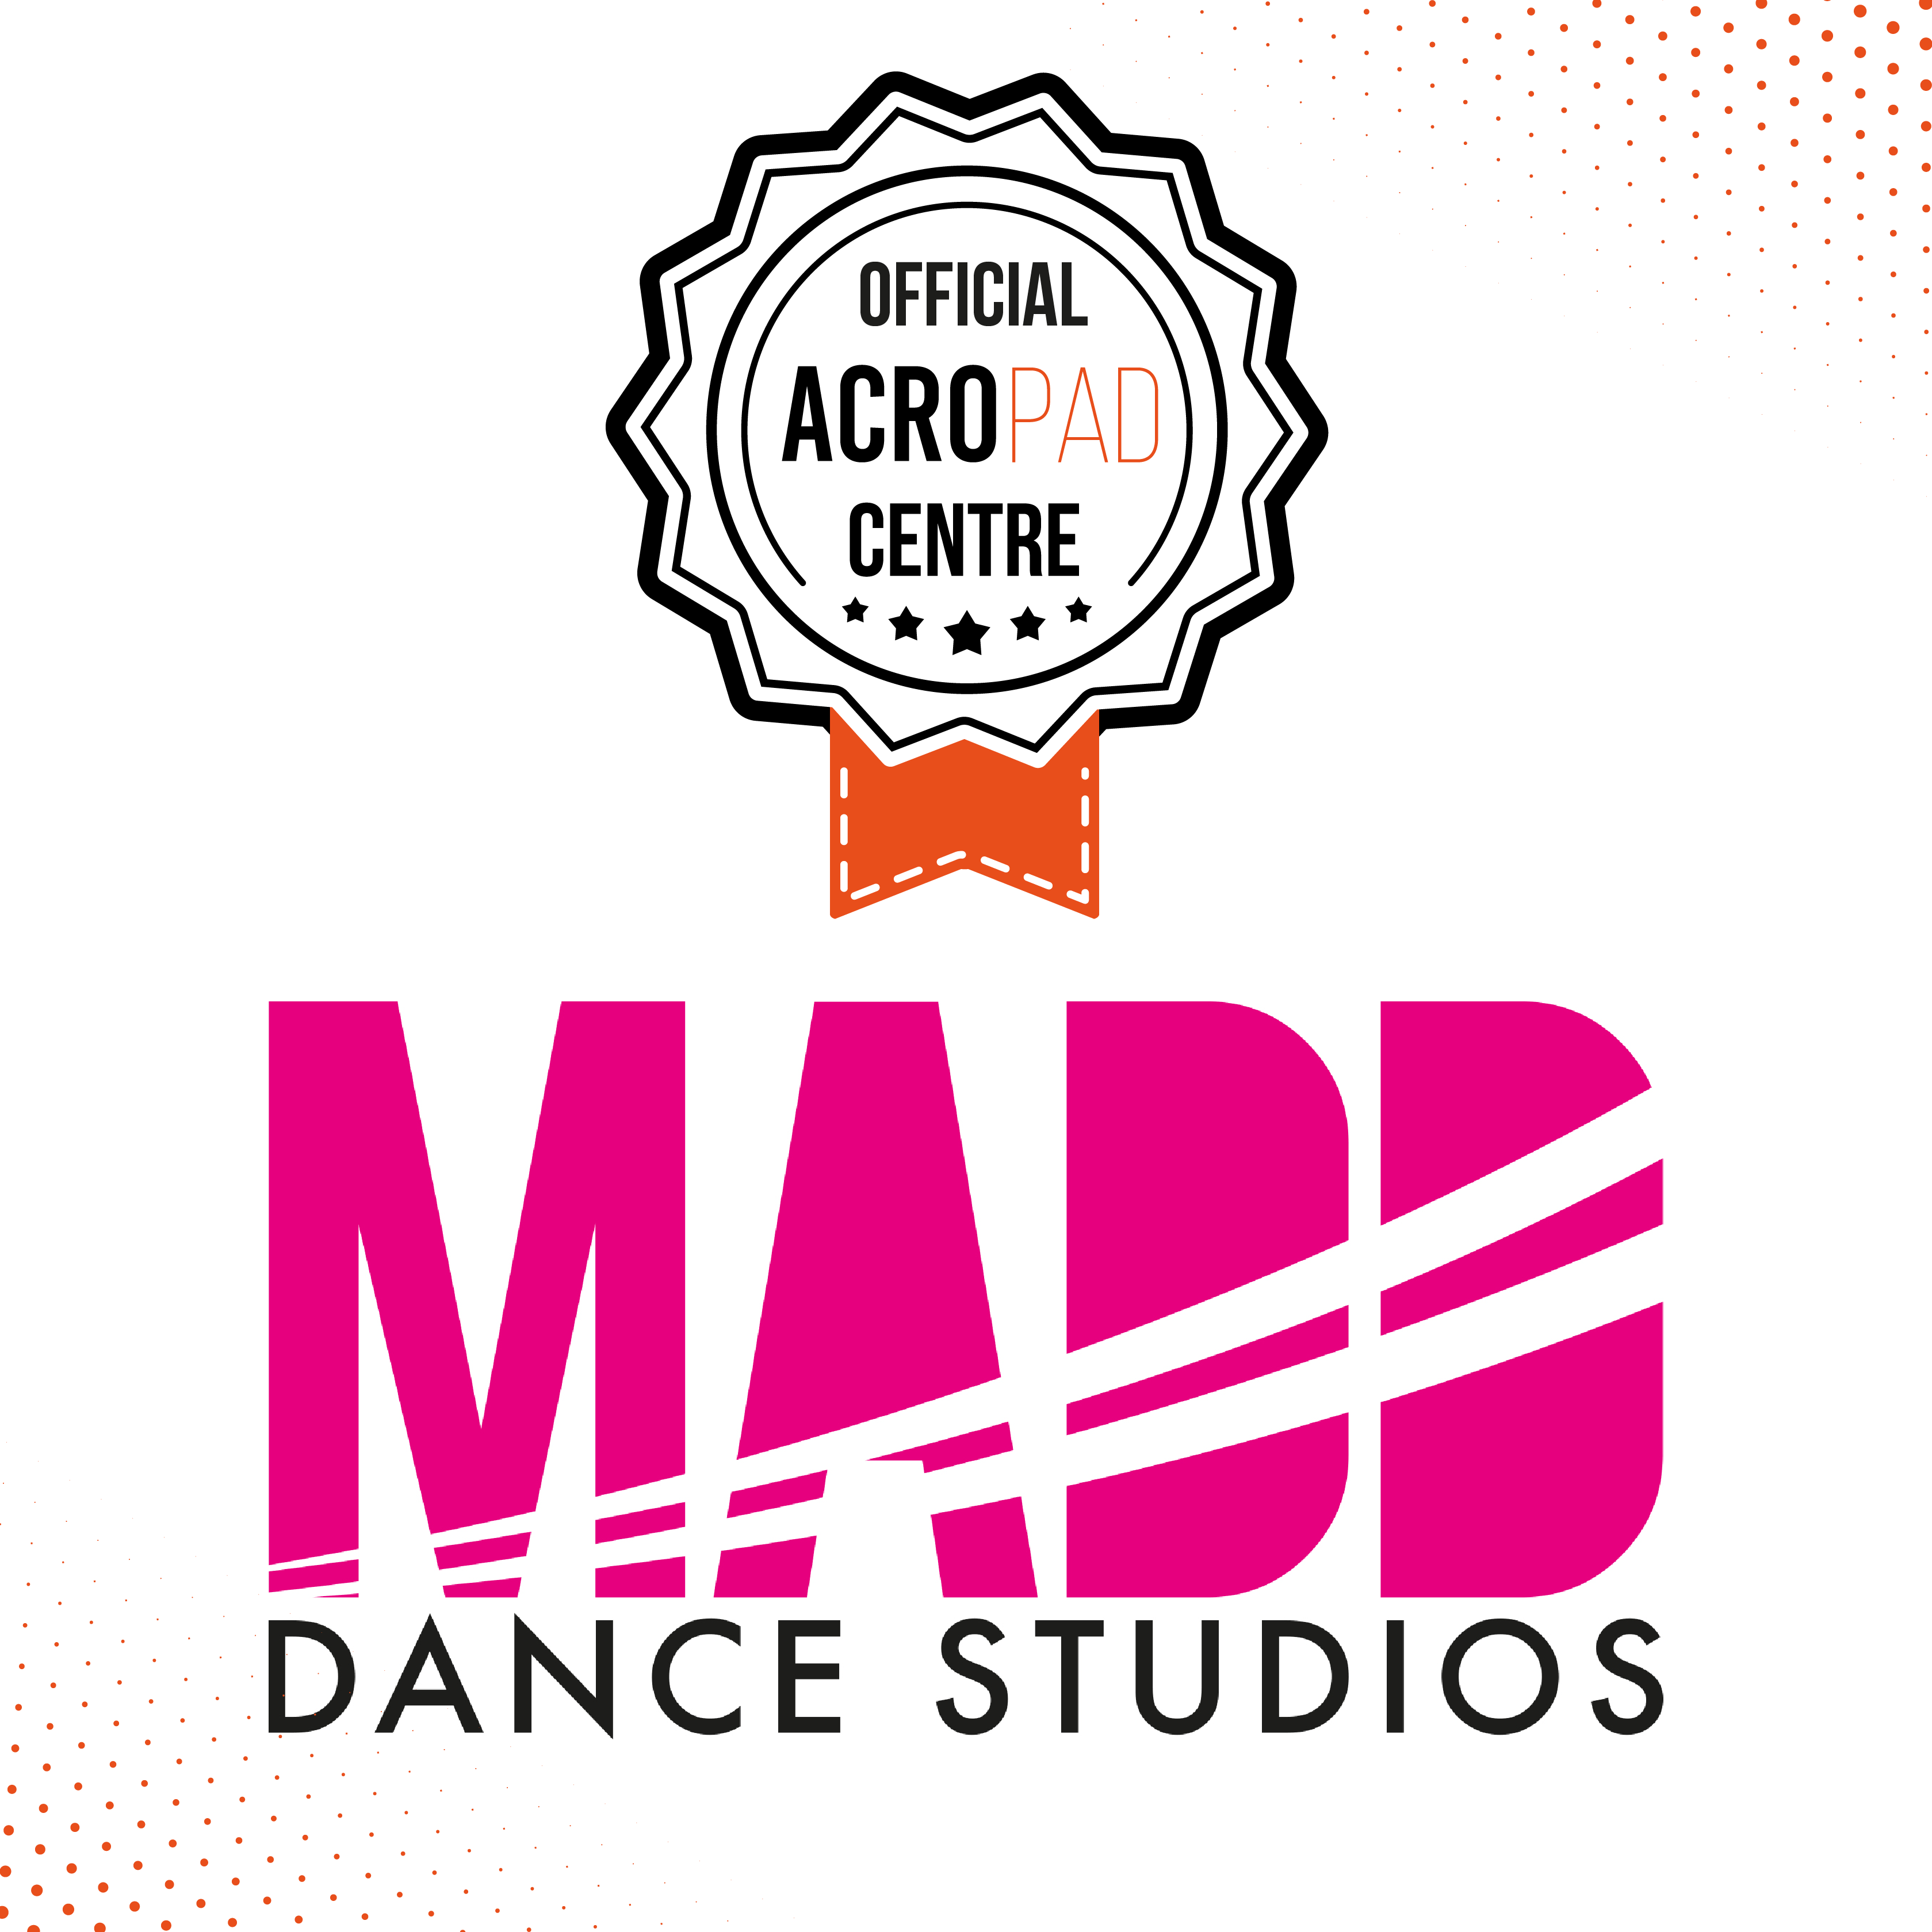 Acro pad logo